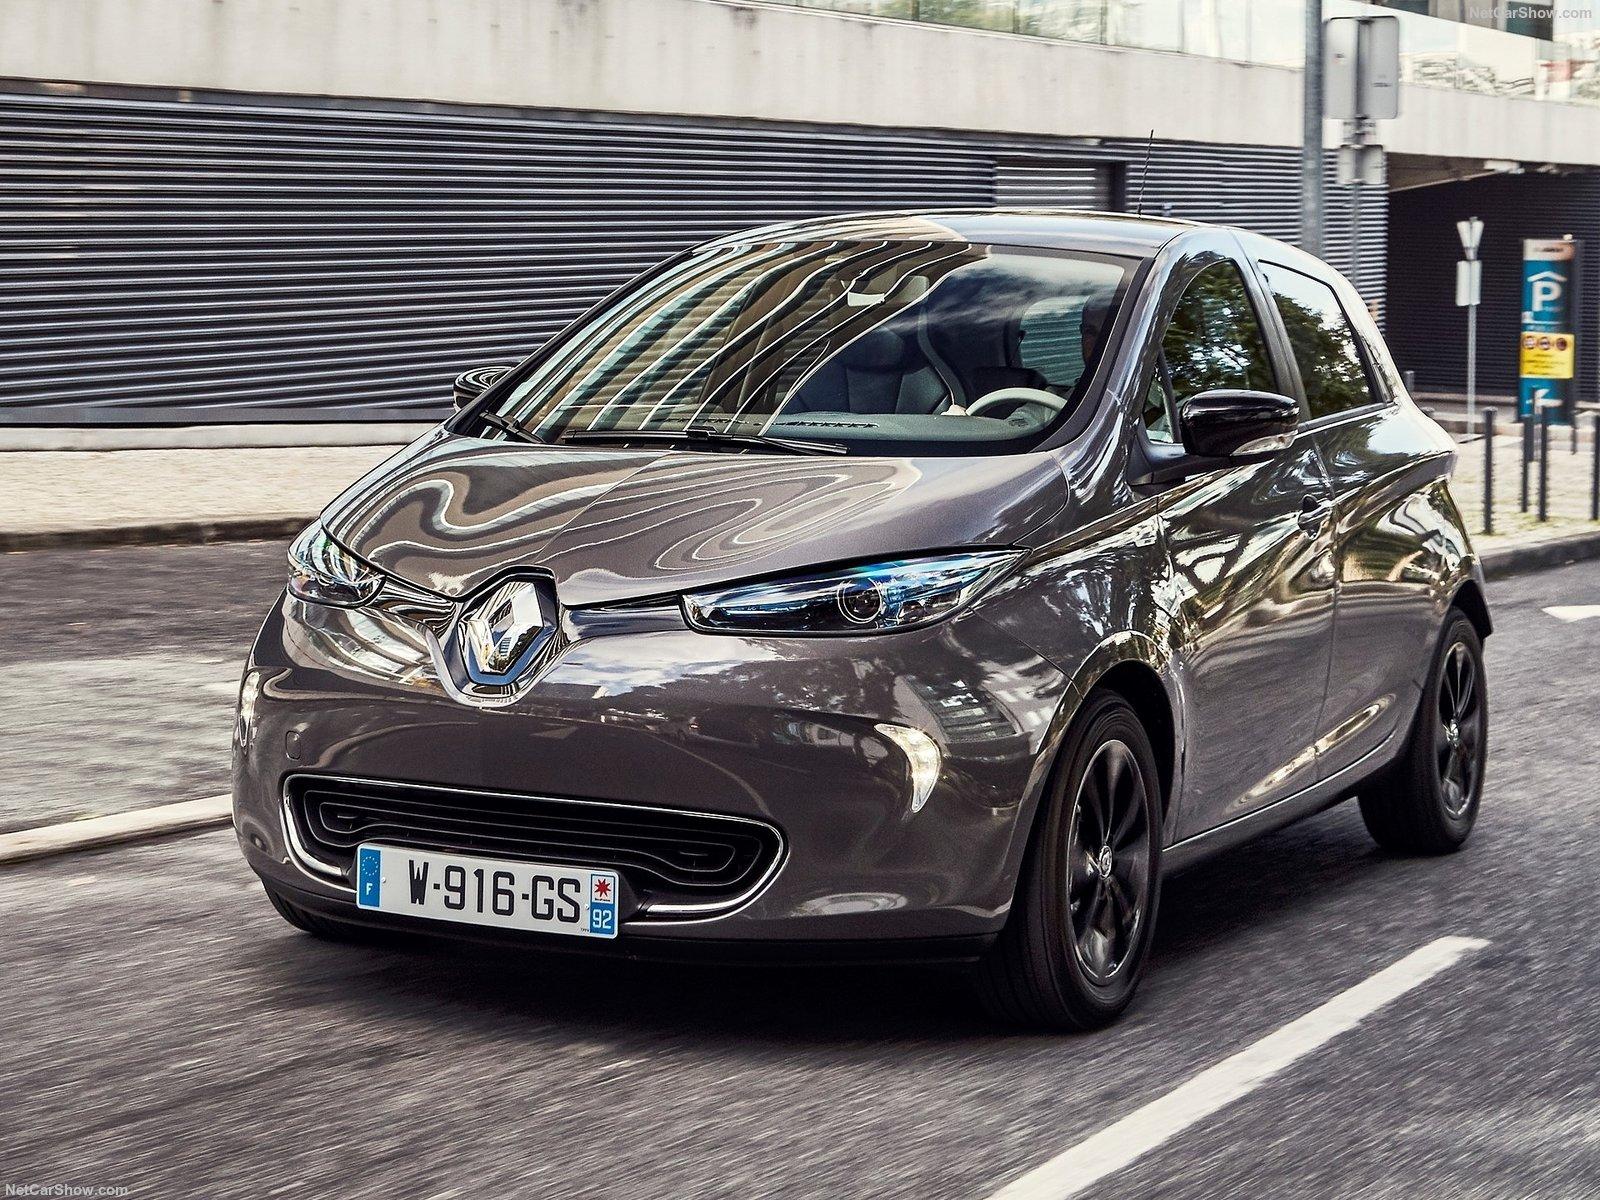 Renault Zoe на территории Германии можно получить почти бесплатно